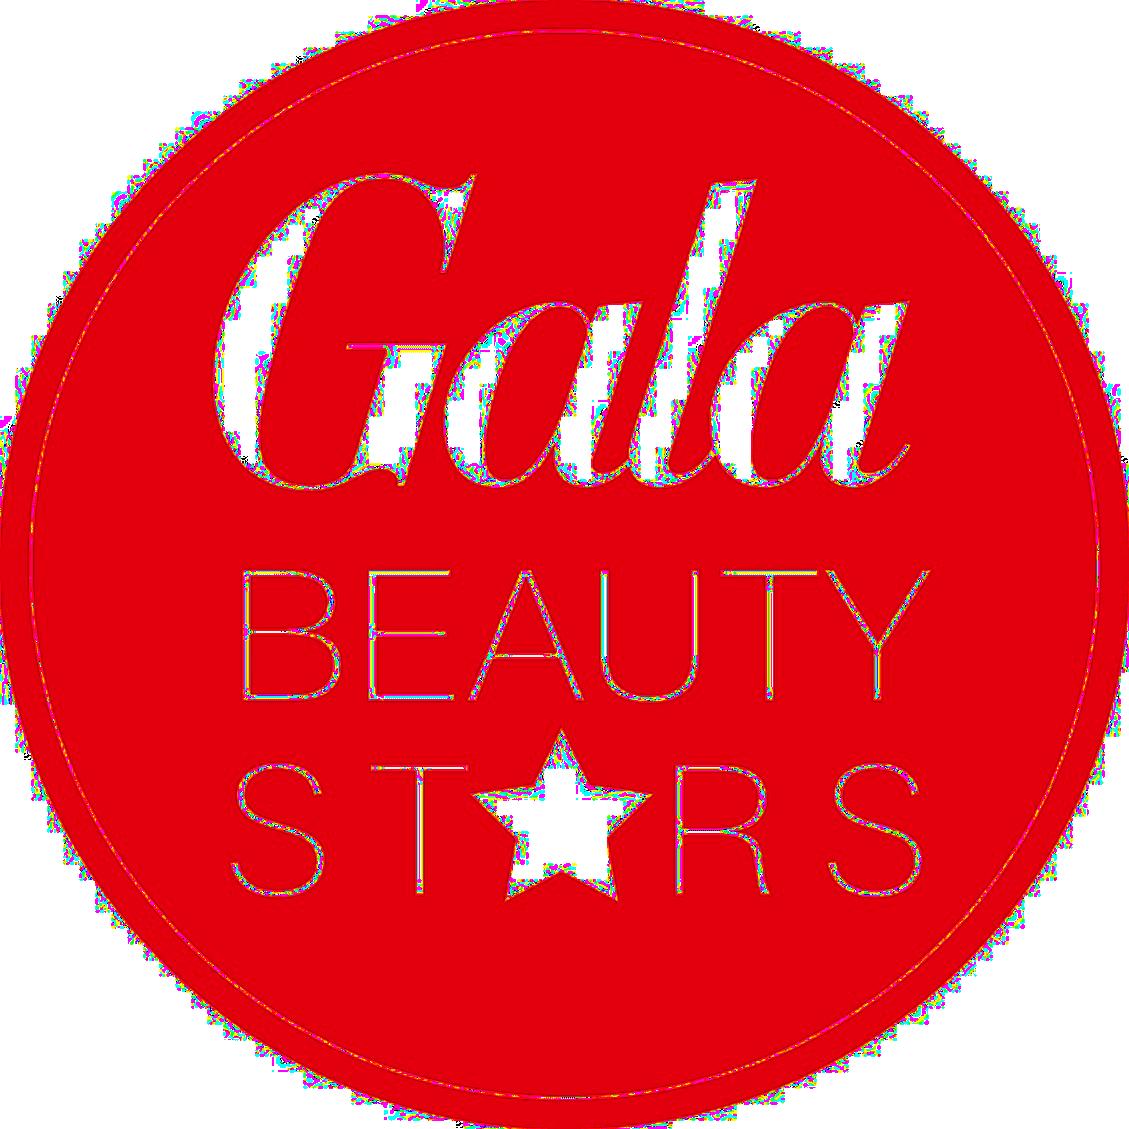 Gala Beauty Stars 2017 - Najlepsze Miejsce Beauty 2017 w kategorii Hotele & SPA